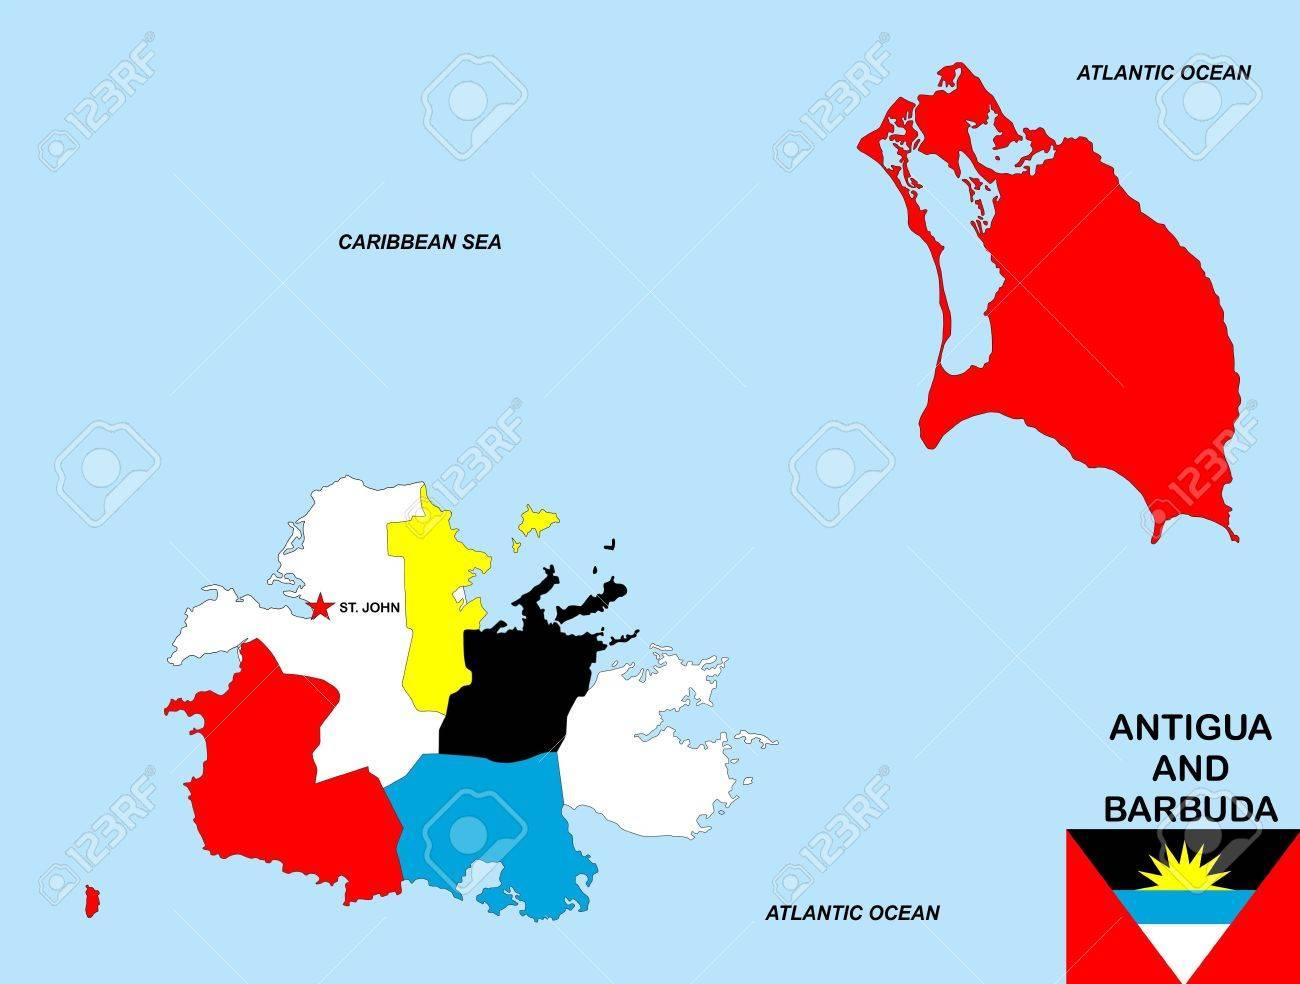 Very Big Size Antigua And Barbuda Political Map With Flag Stock - Antigua barbuda map caribbean sea